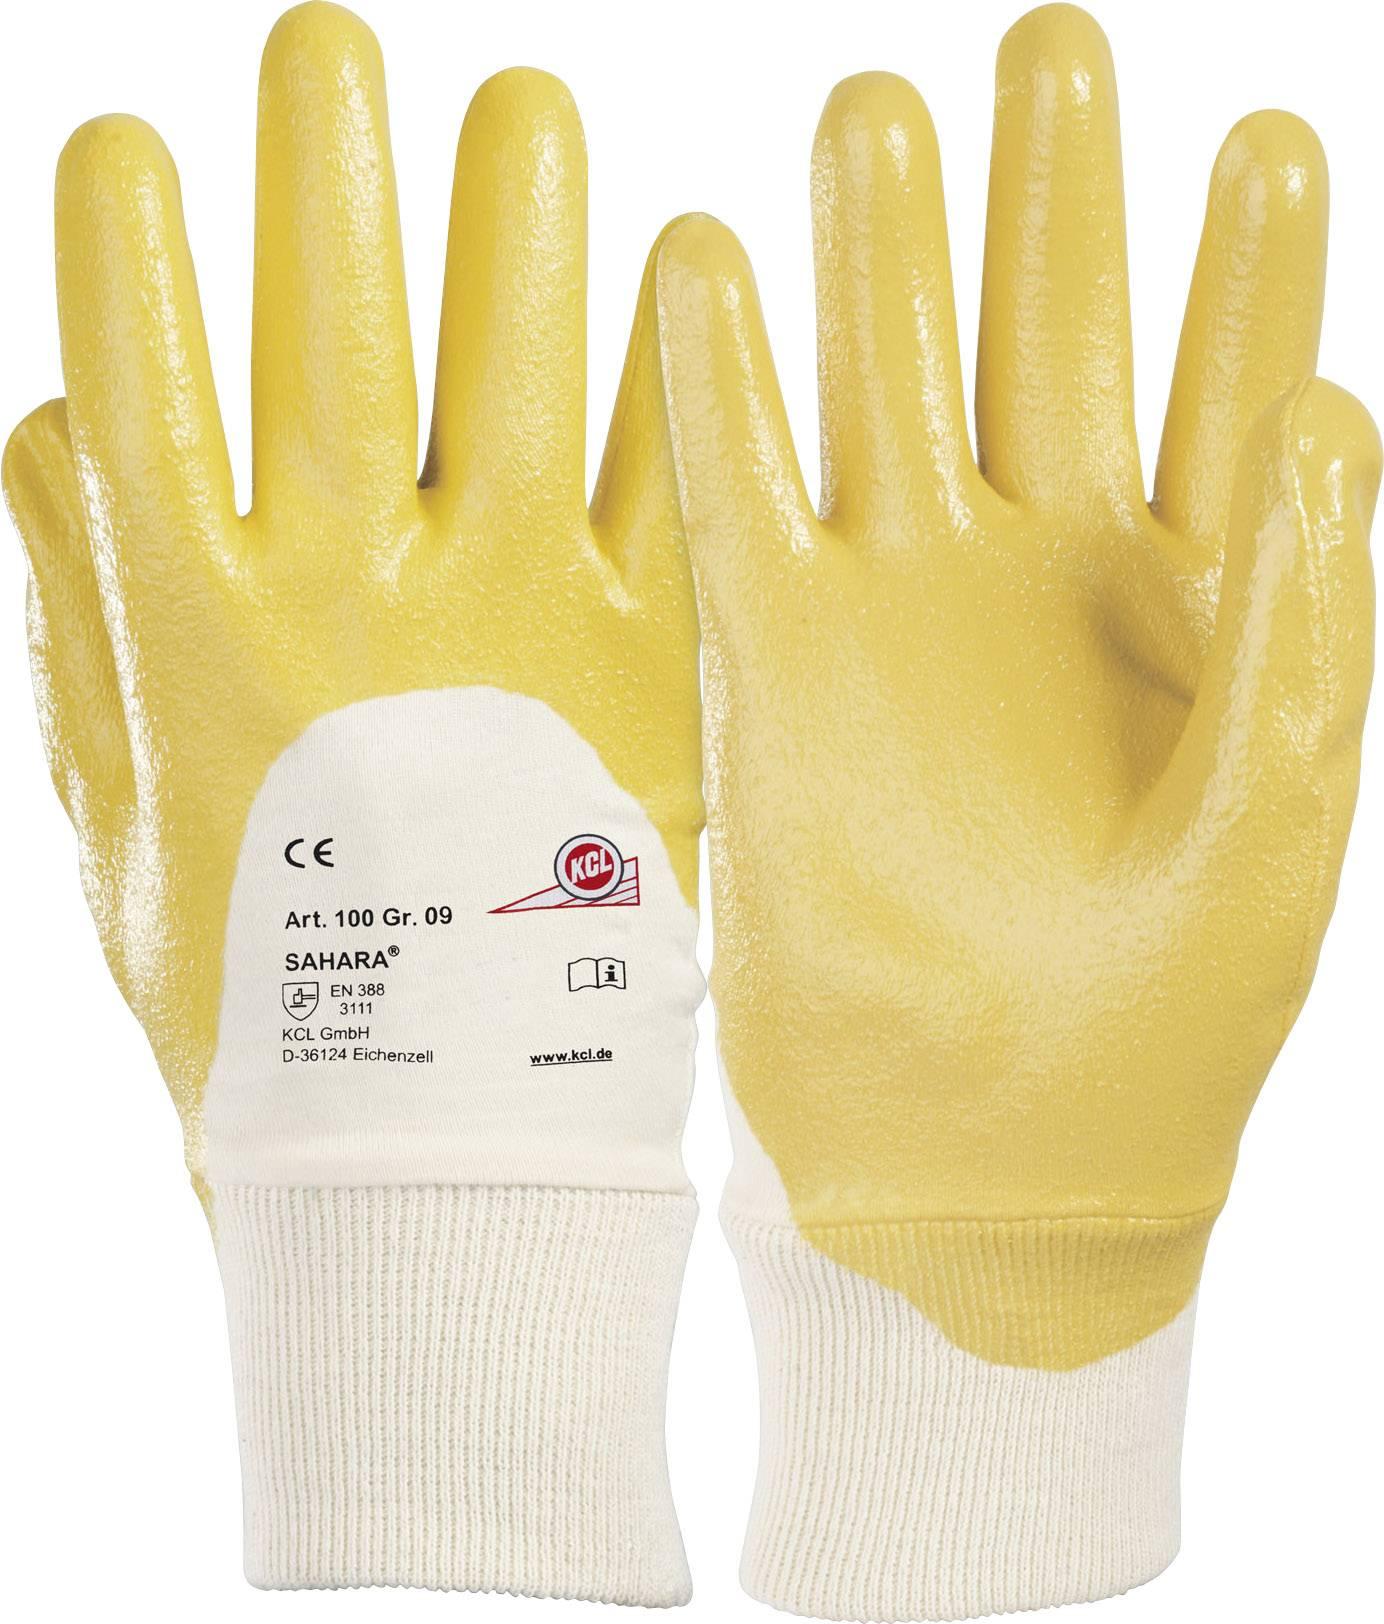 Pracovné rukavice KCL Sahara® 100, velikost rukavic: 8, M